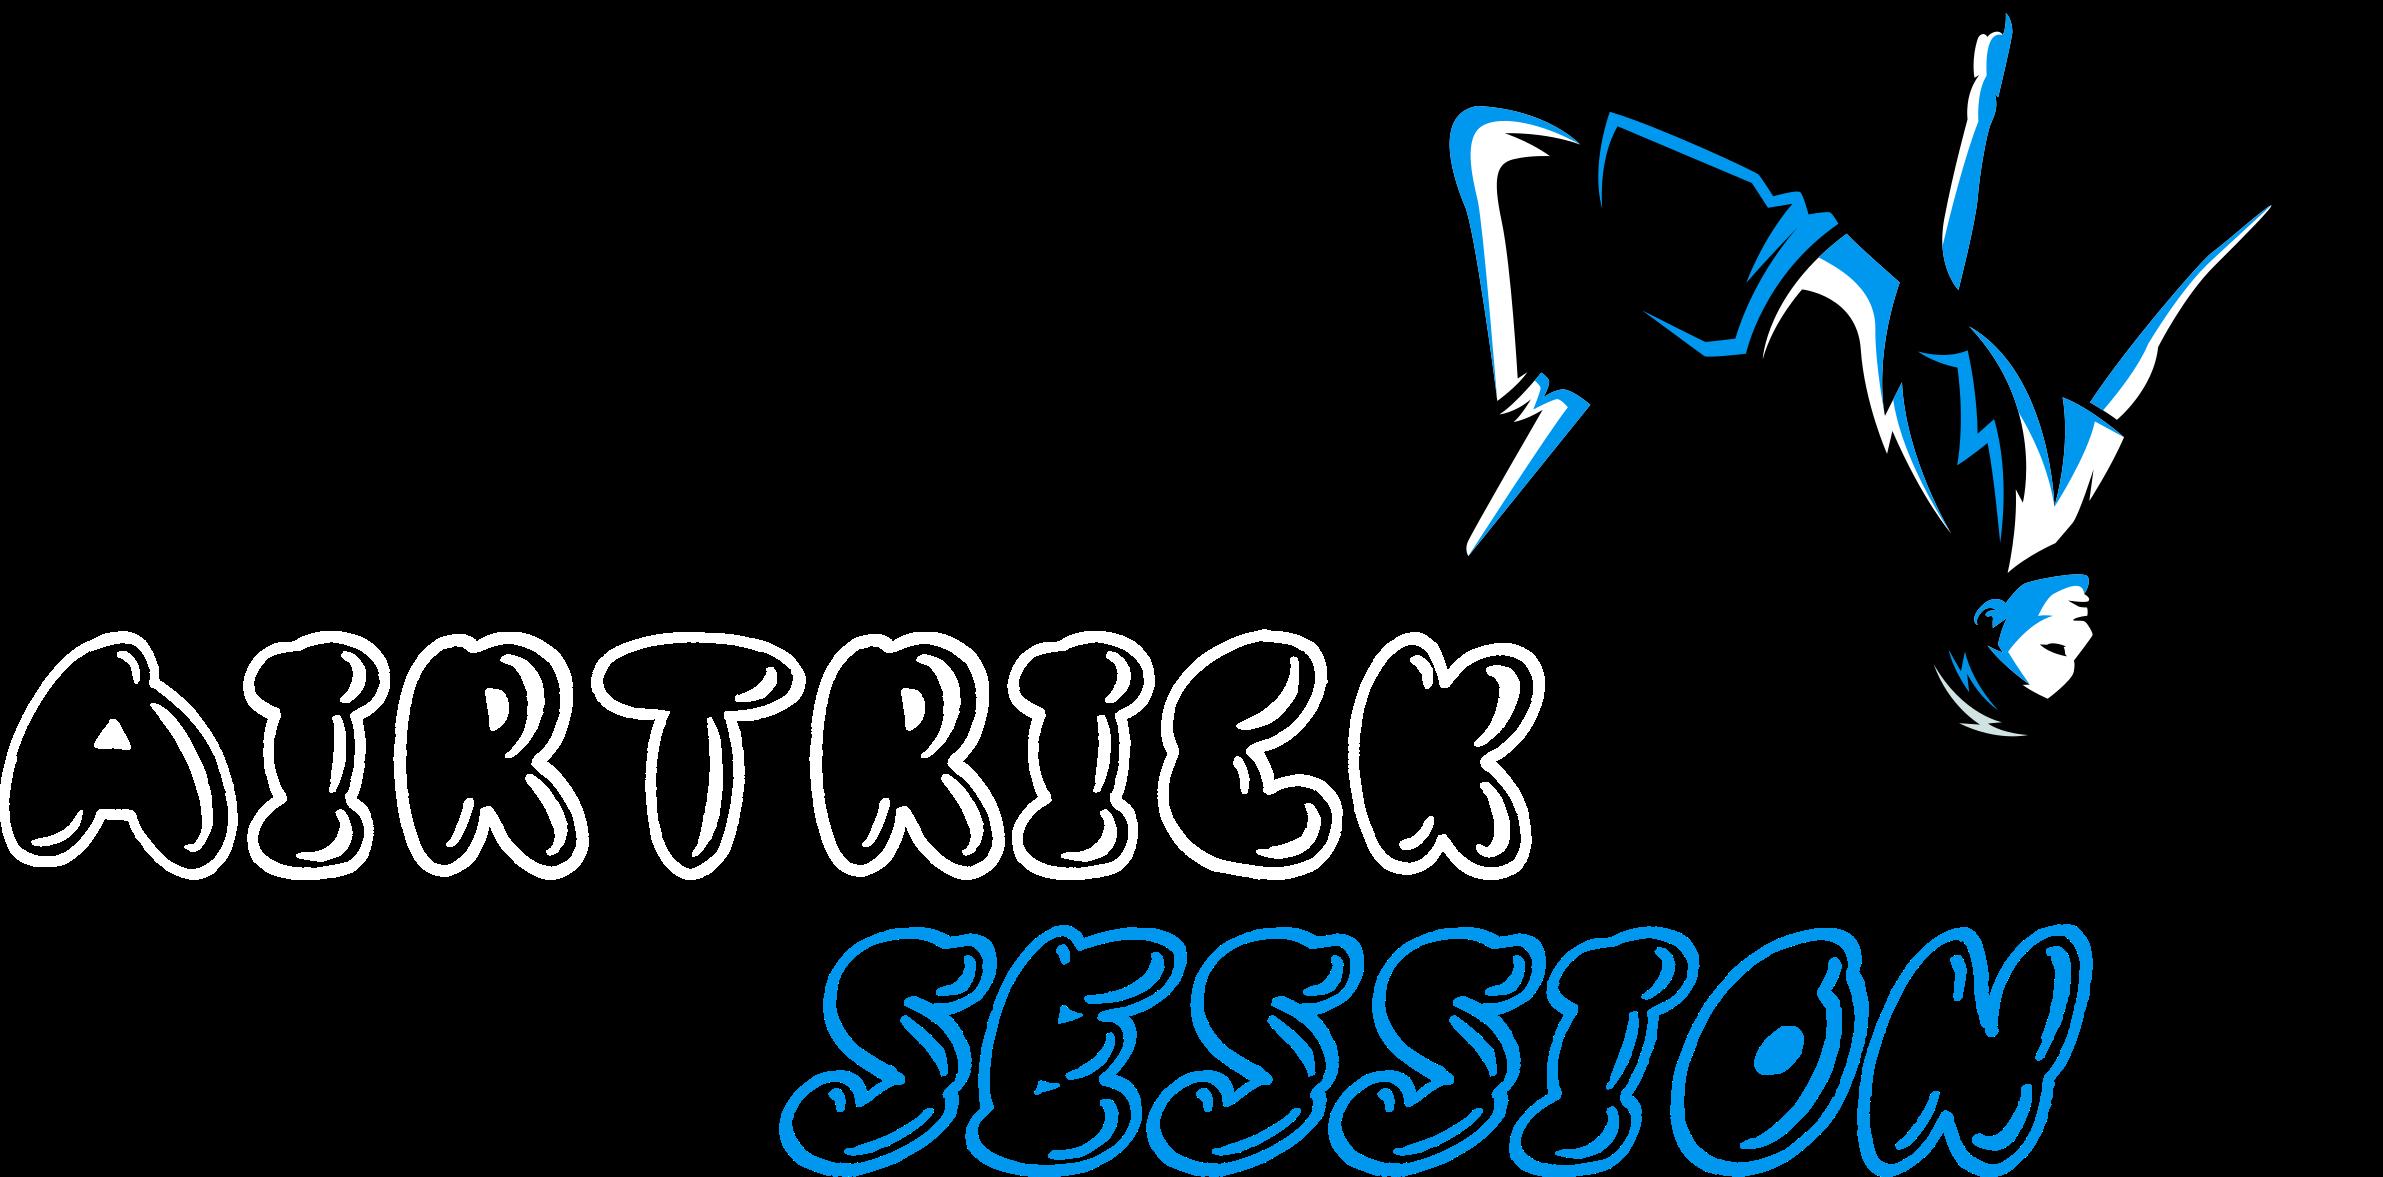 Airstrick Session Logo Transparent